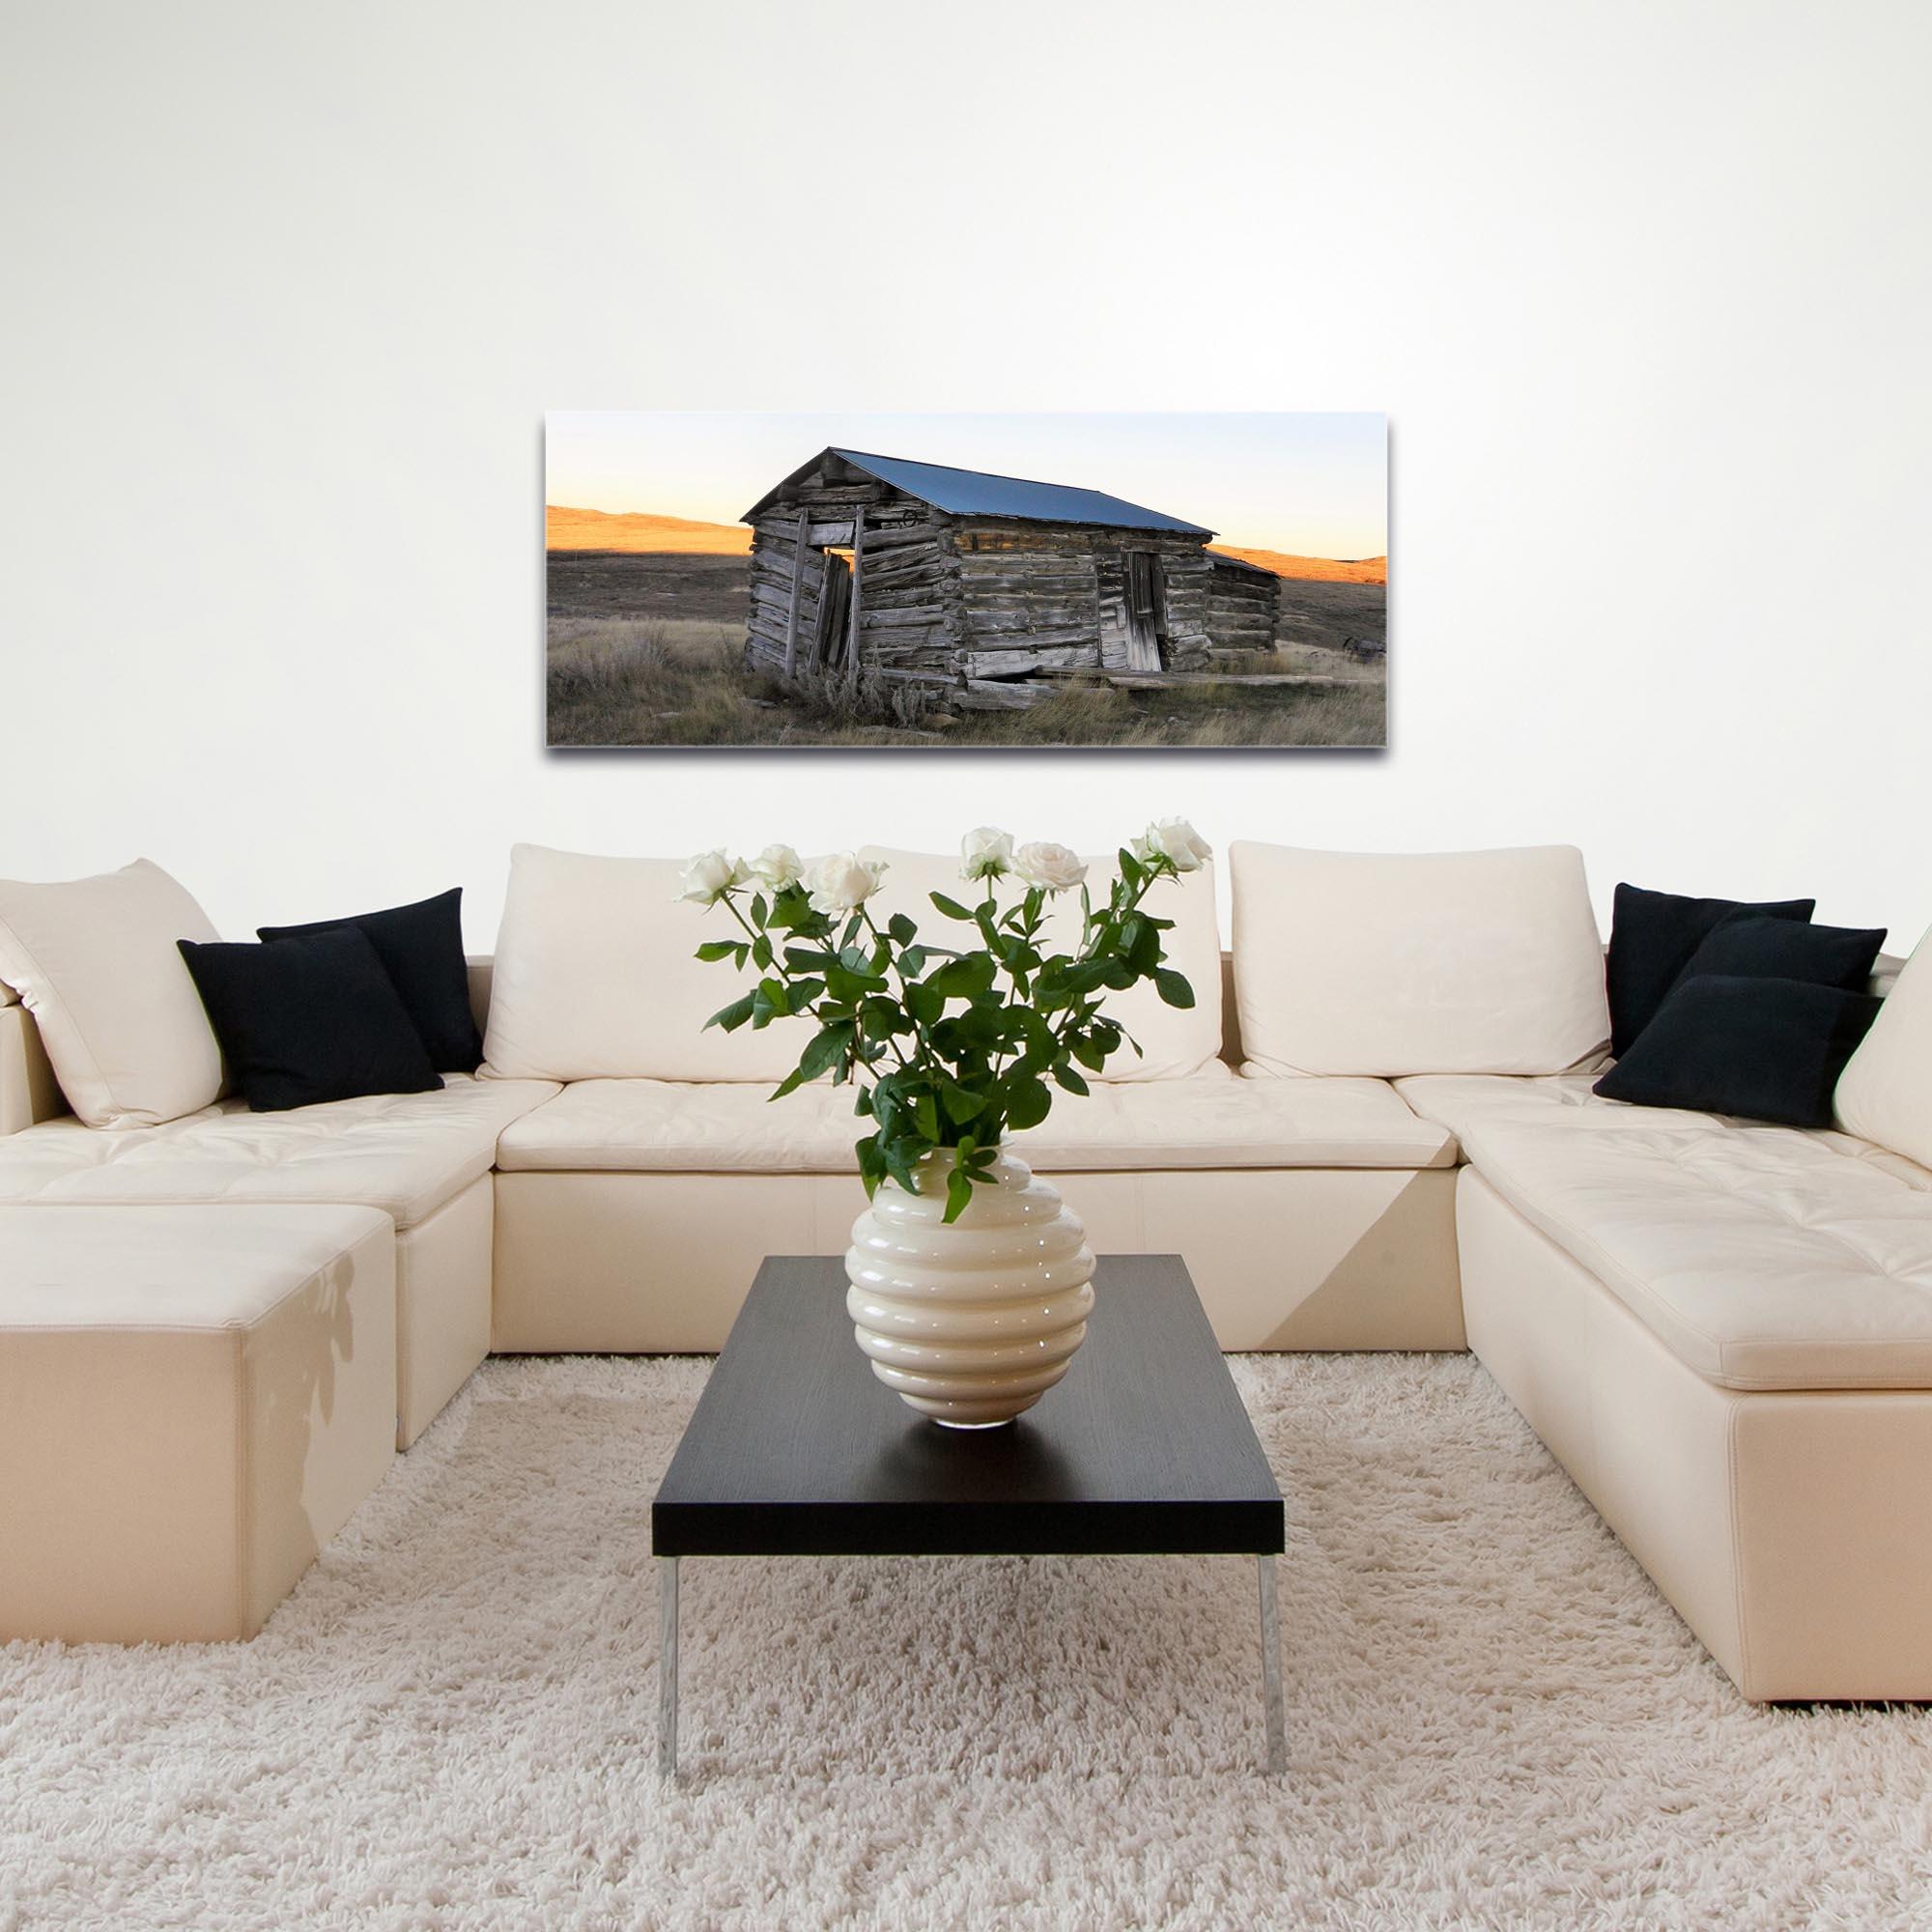 Western Wall Art 'The Log House' - American West Decor on Metal or Plexiglass - Image 3